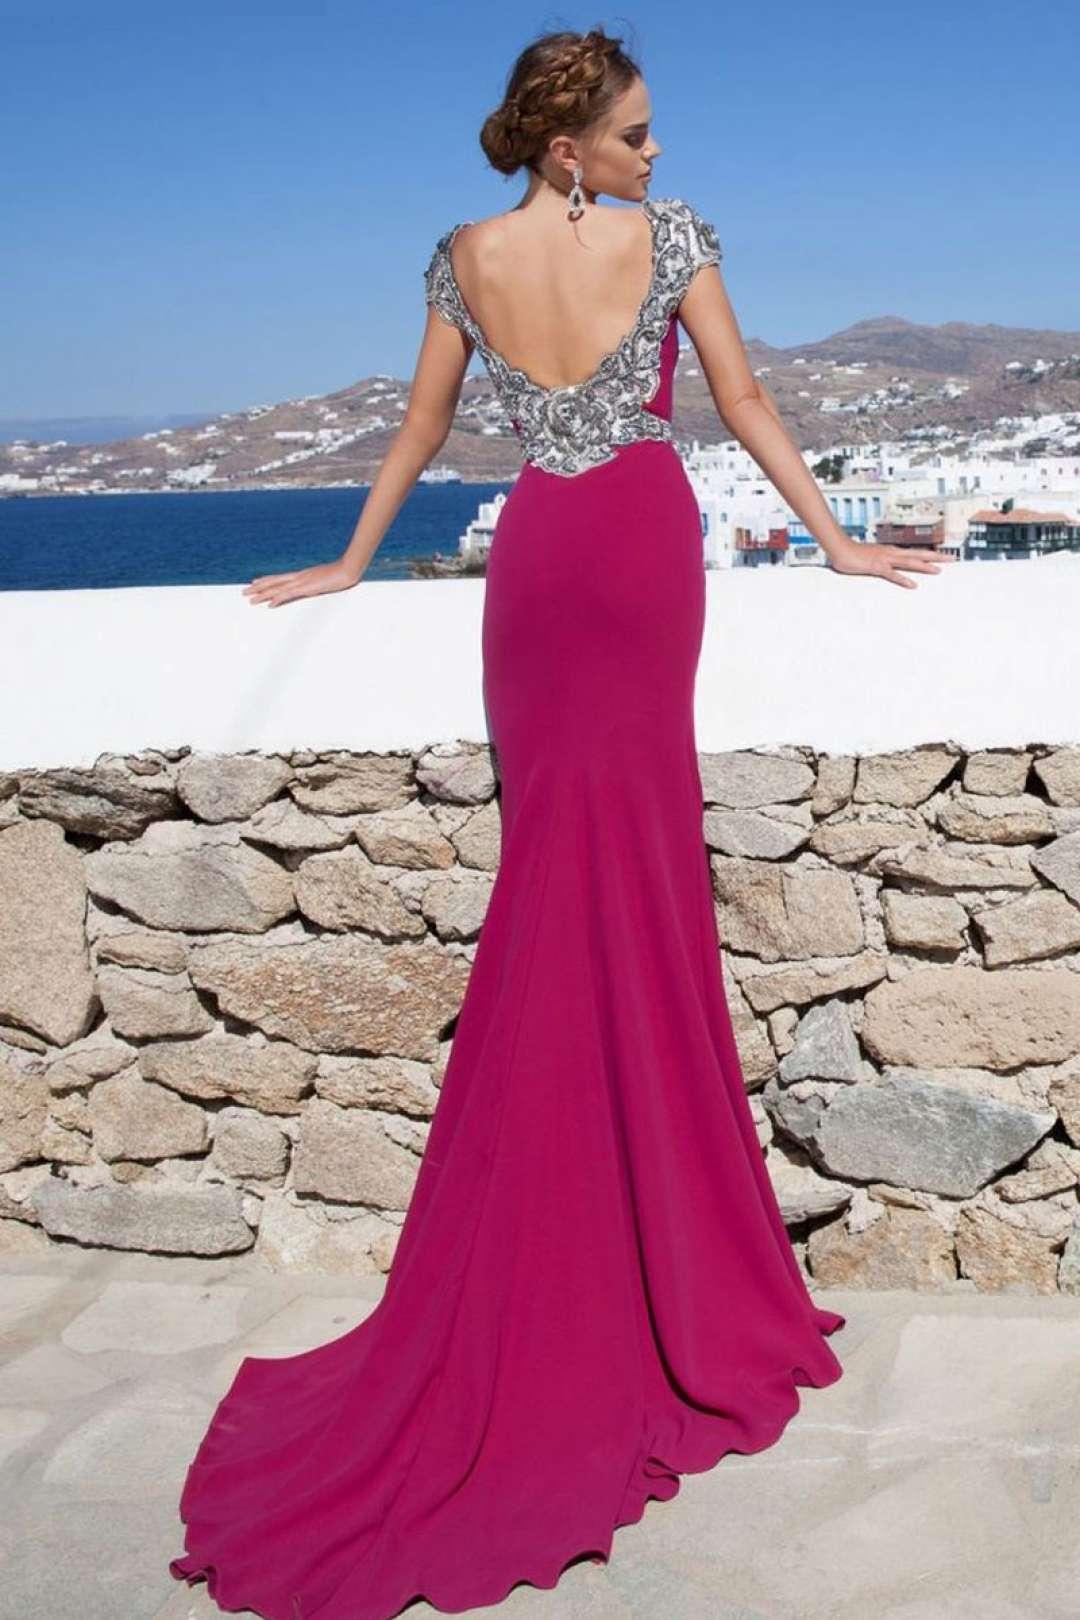 Rentar vestidos de noche – Moda Española moderna